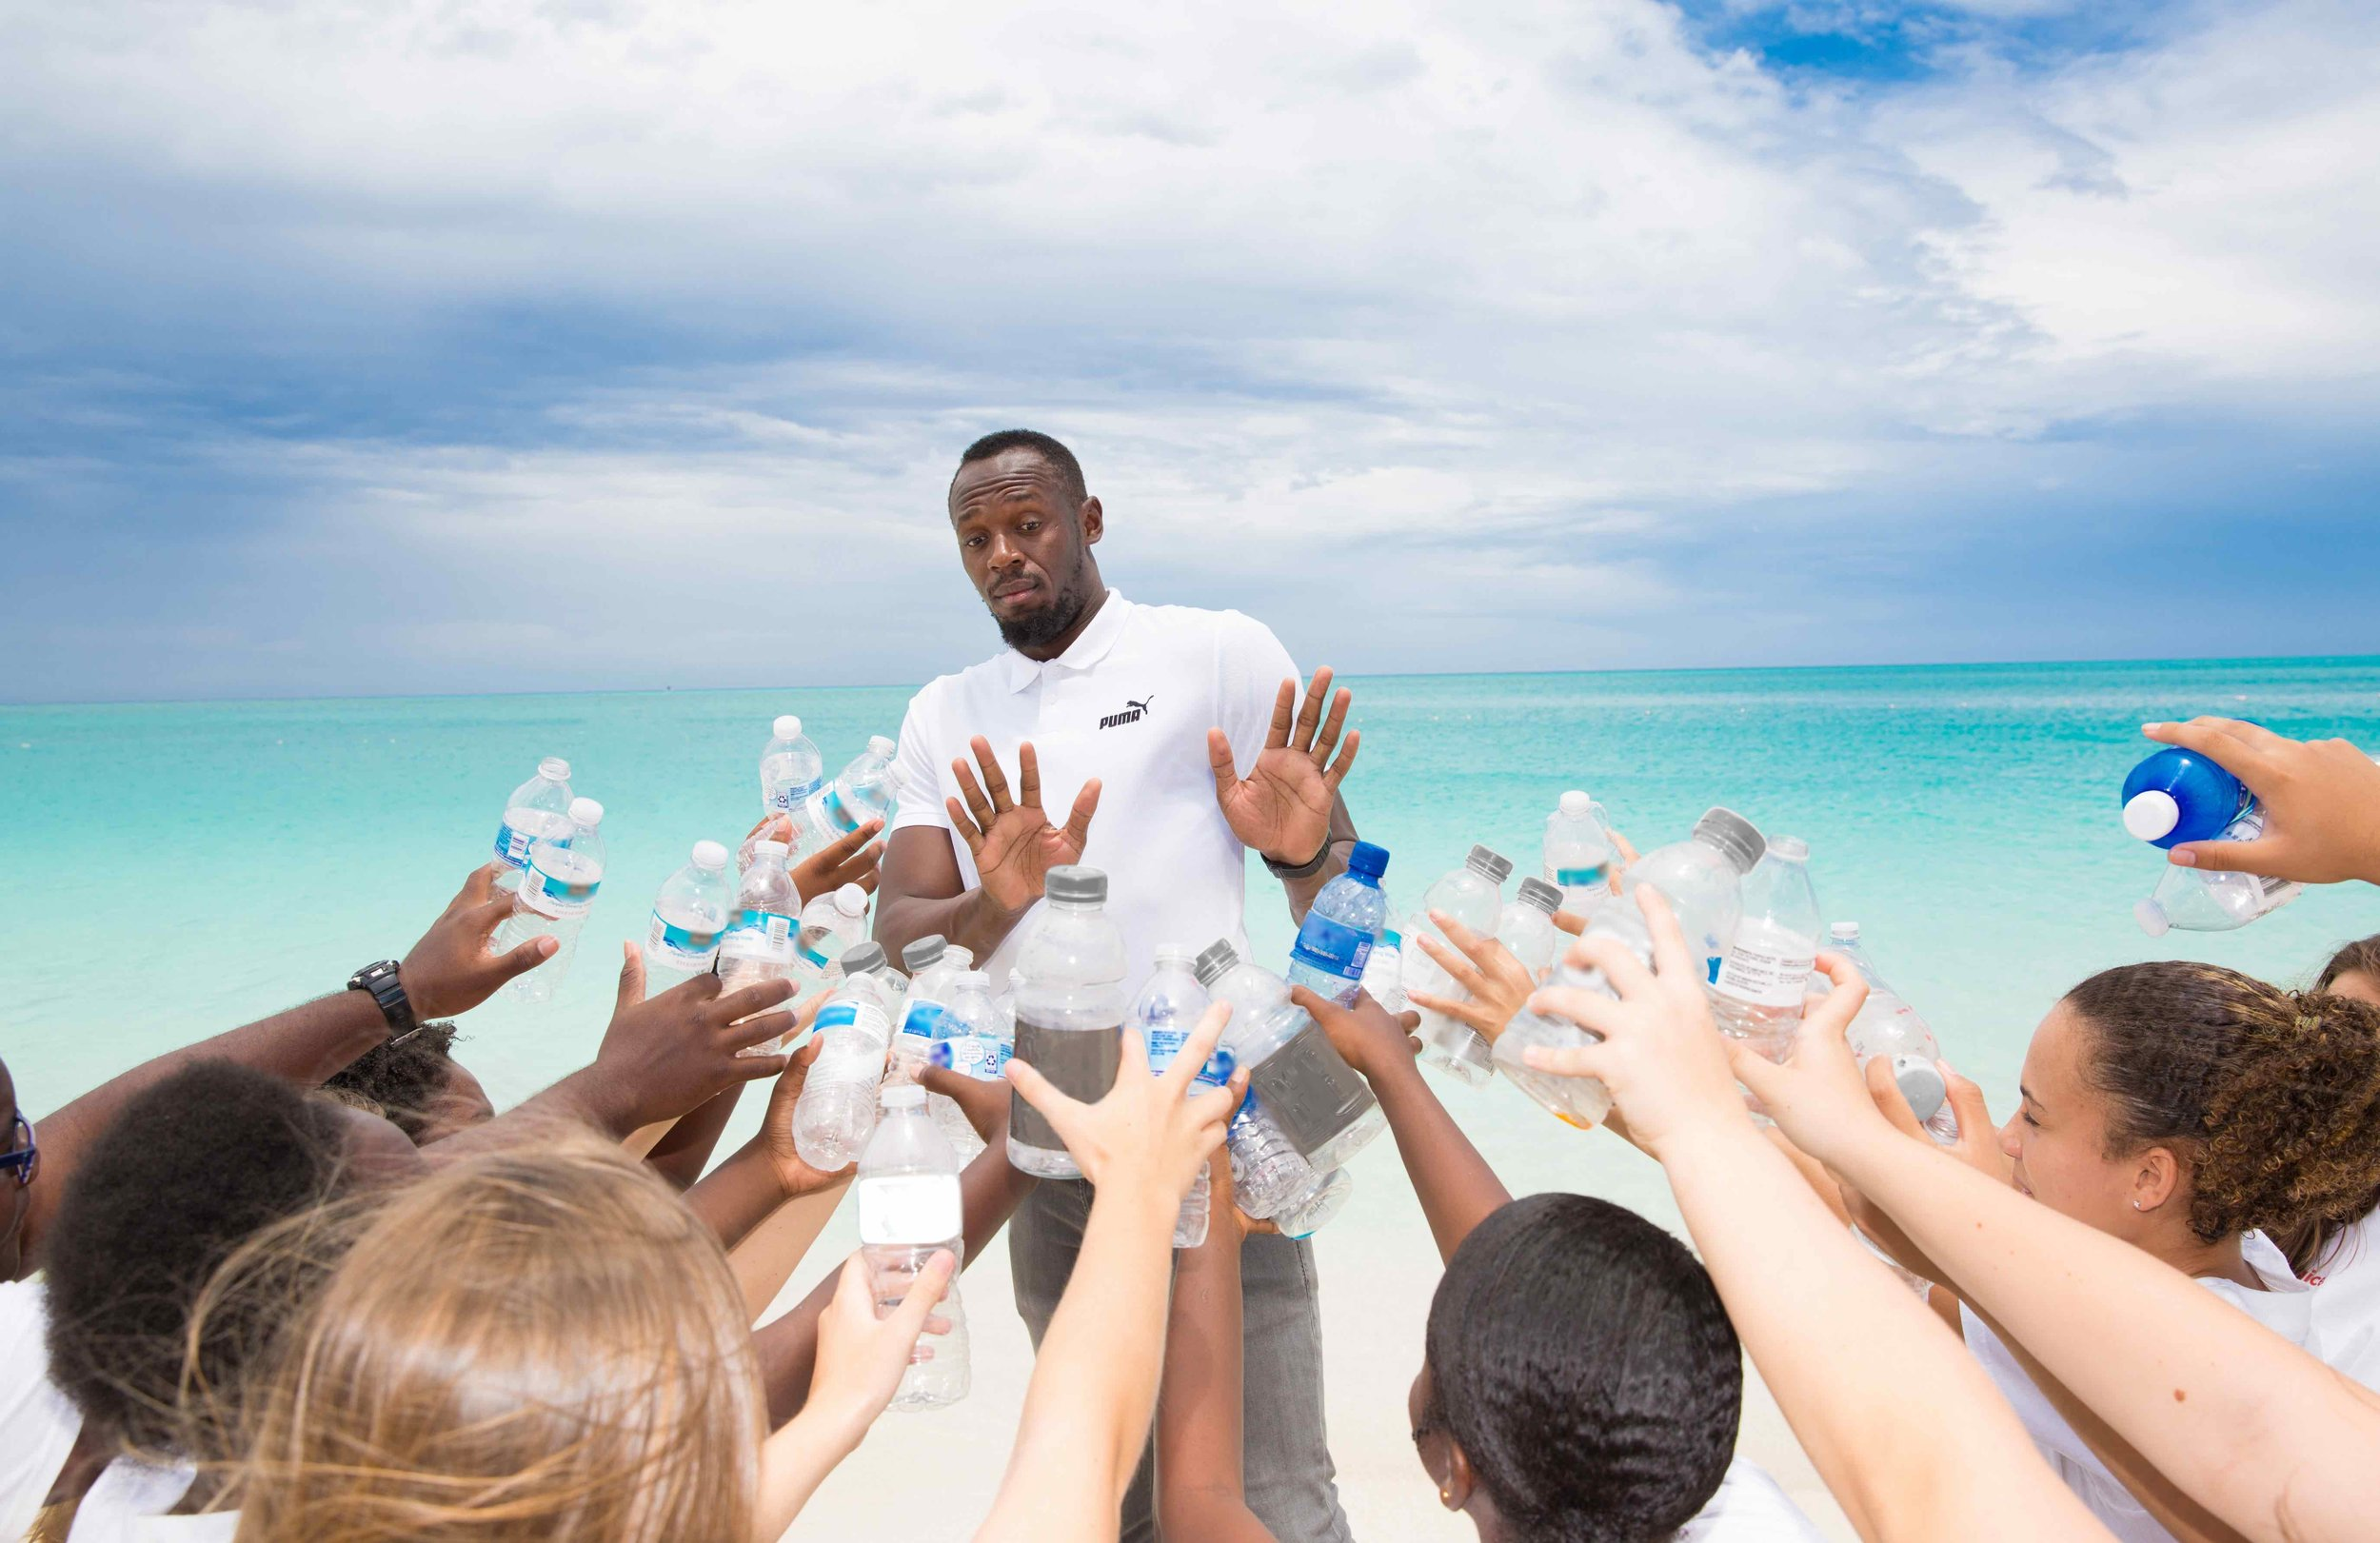 Usain Bolt Turks And Caicos.jpg